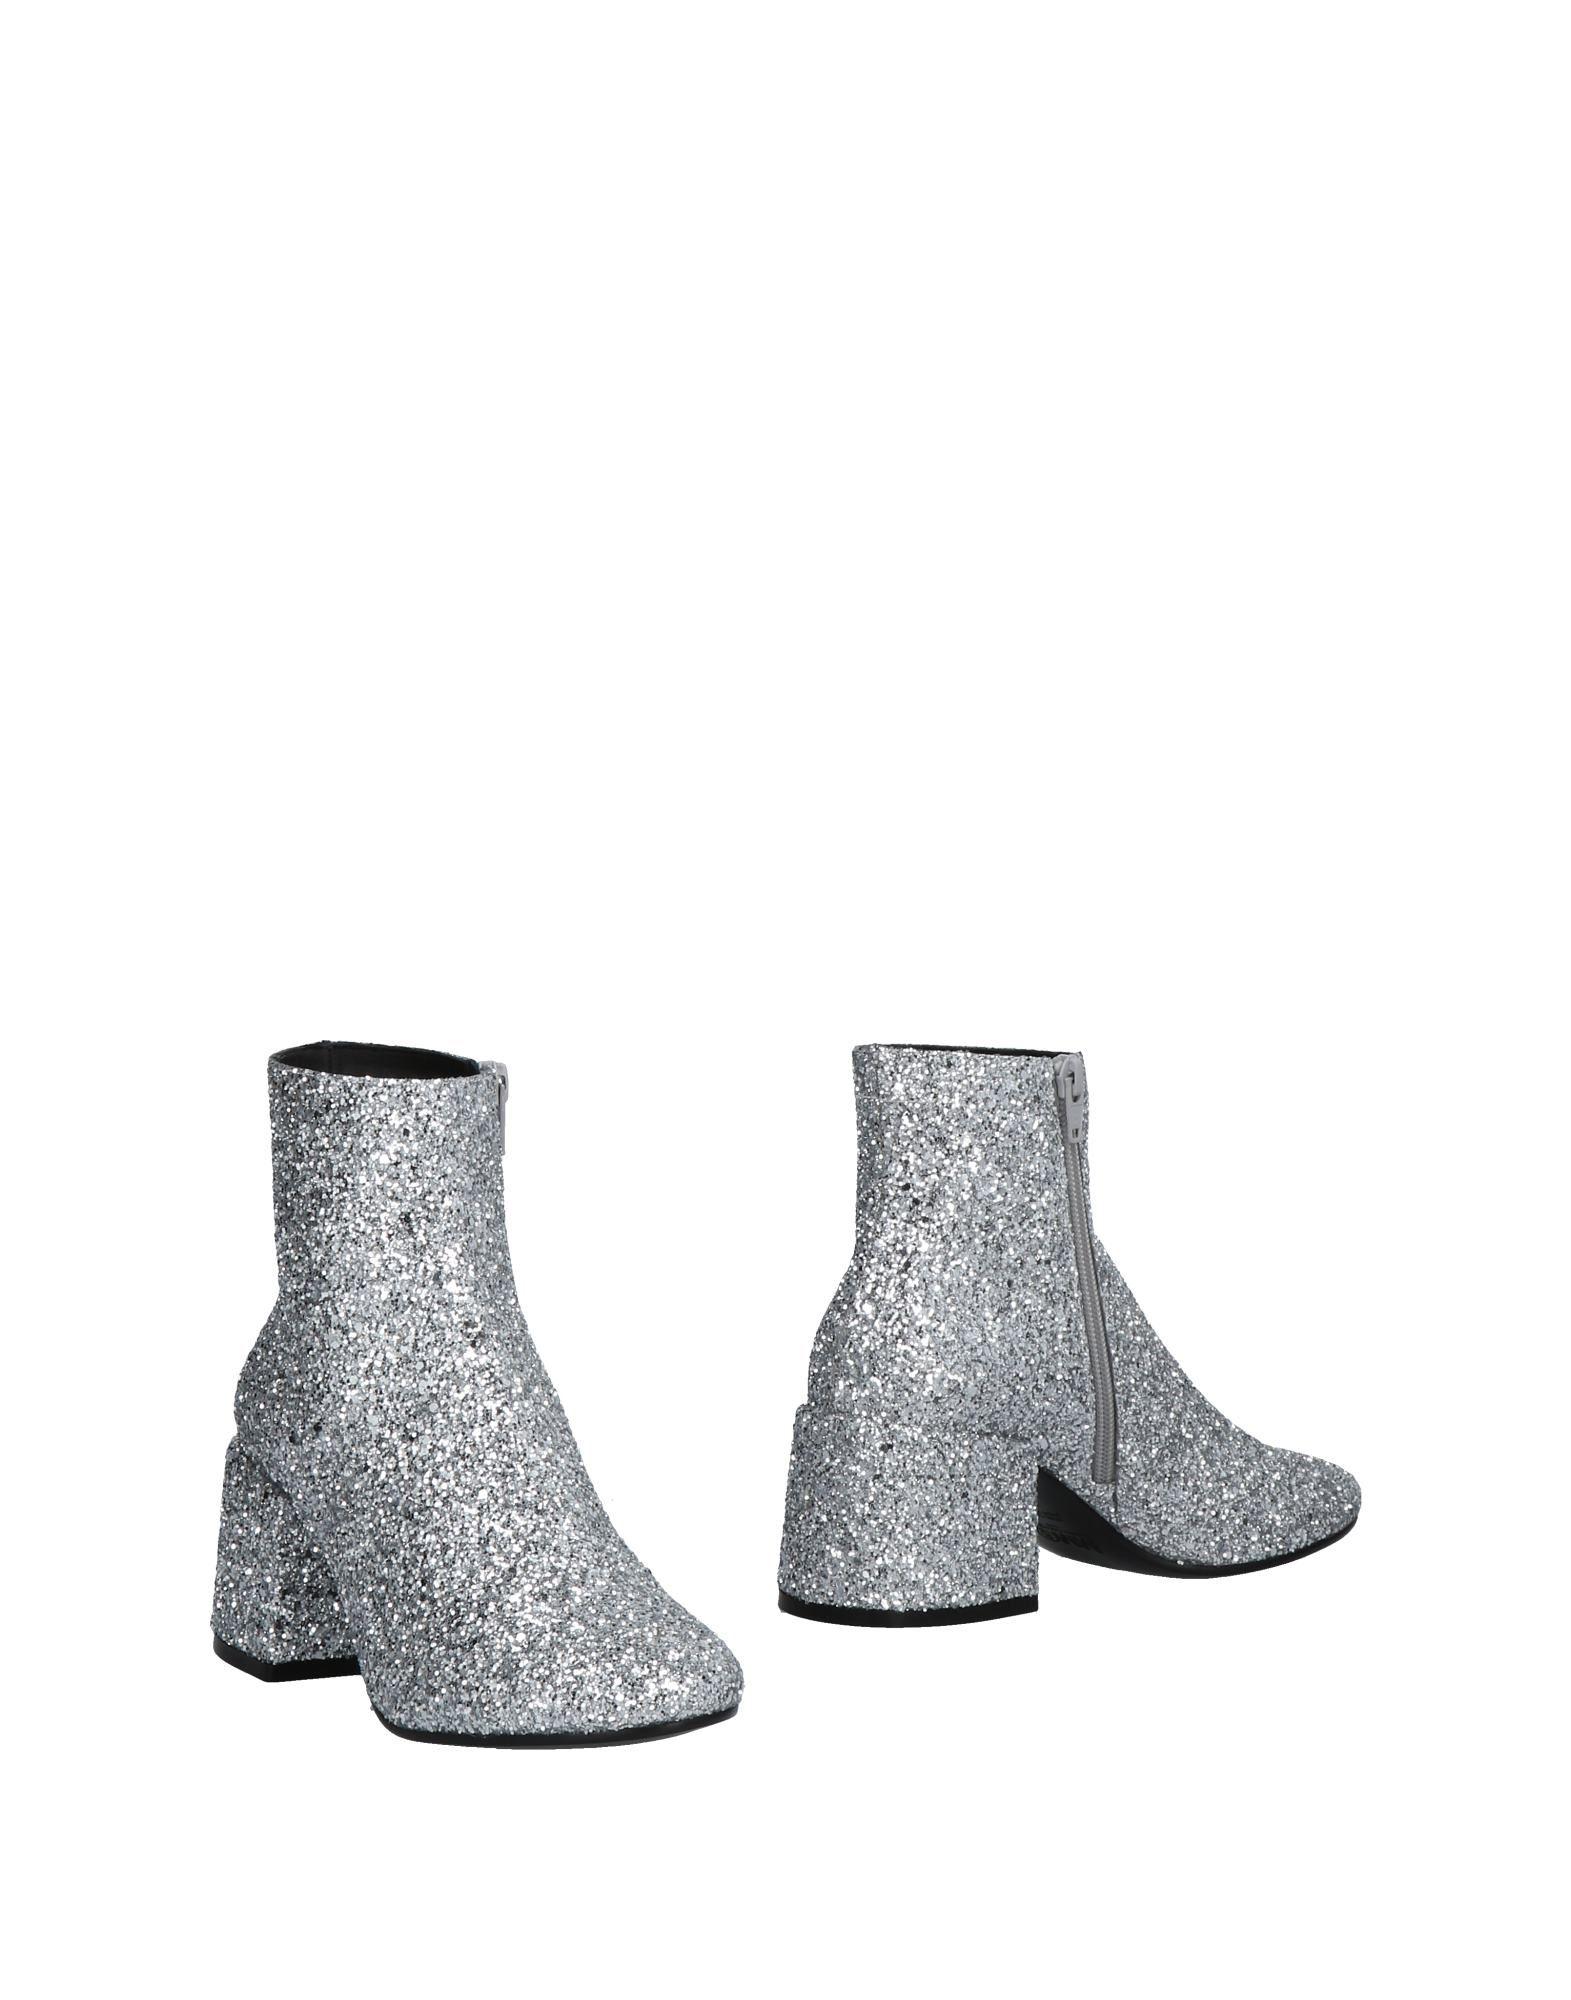 Mm6 Maison Margiela Stiefelette Damen  11493021AX Neue Schuhe